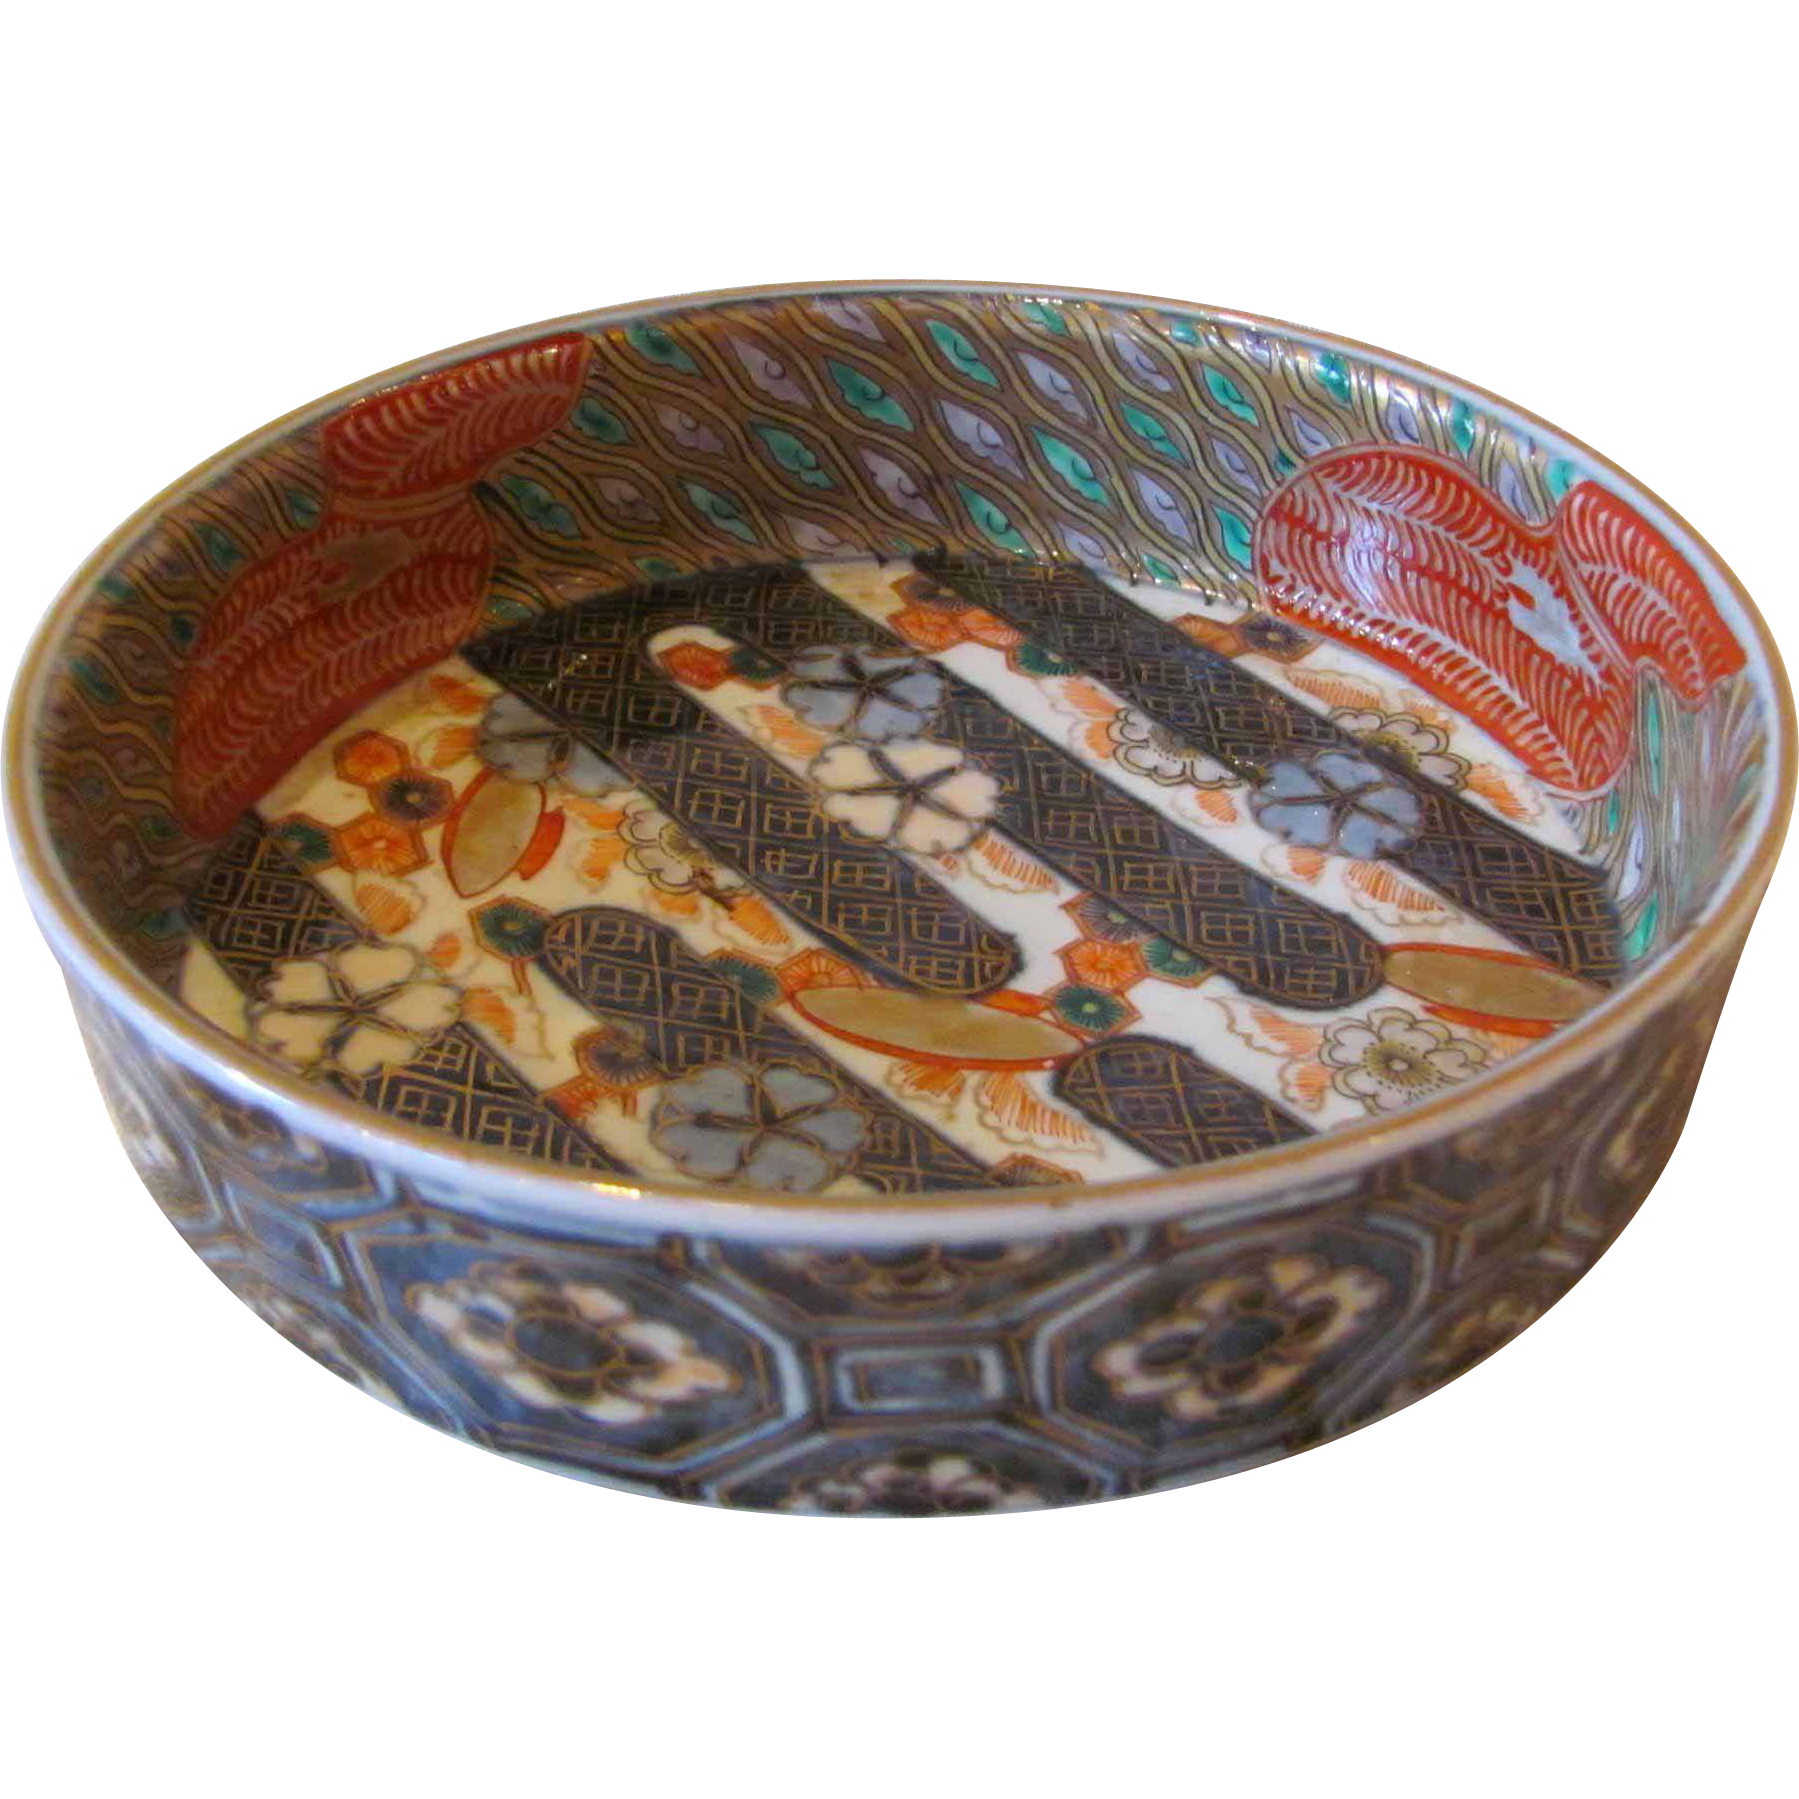 Antique Japanese Kutani Dish Meiji Period Circa 1900